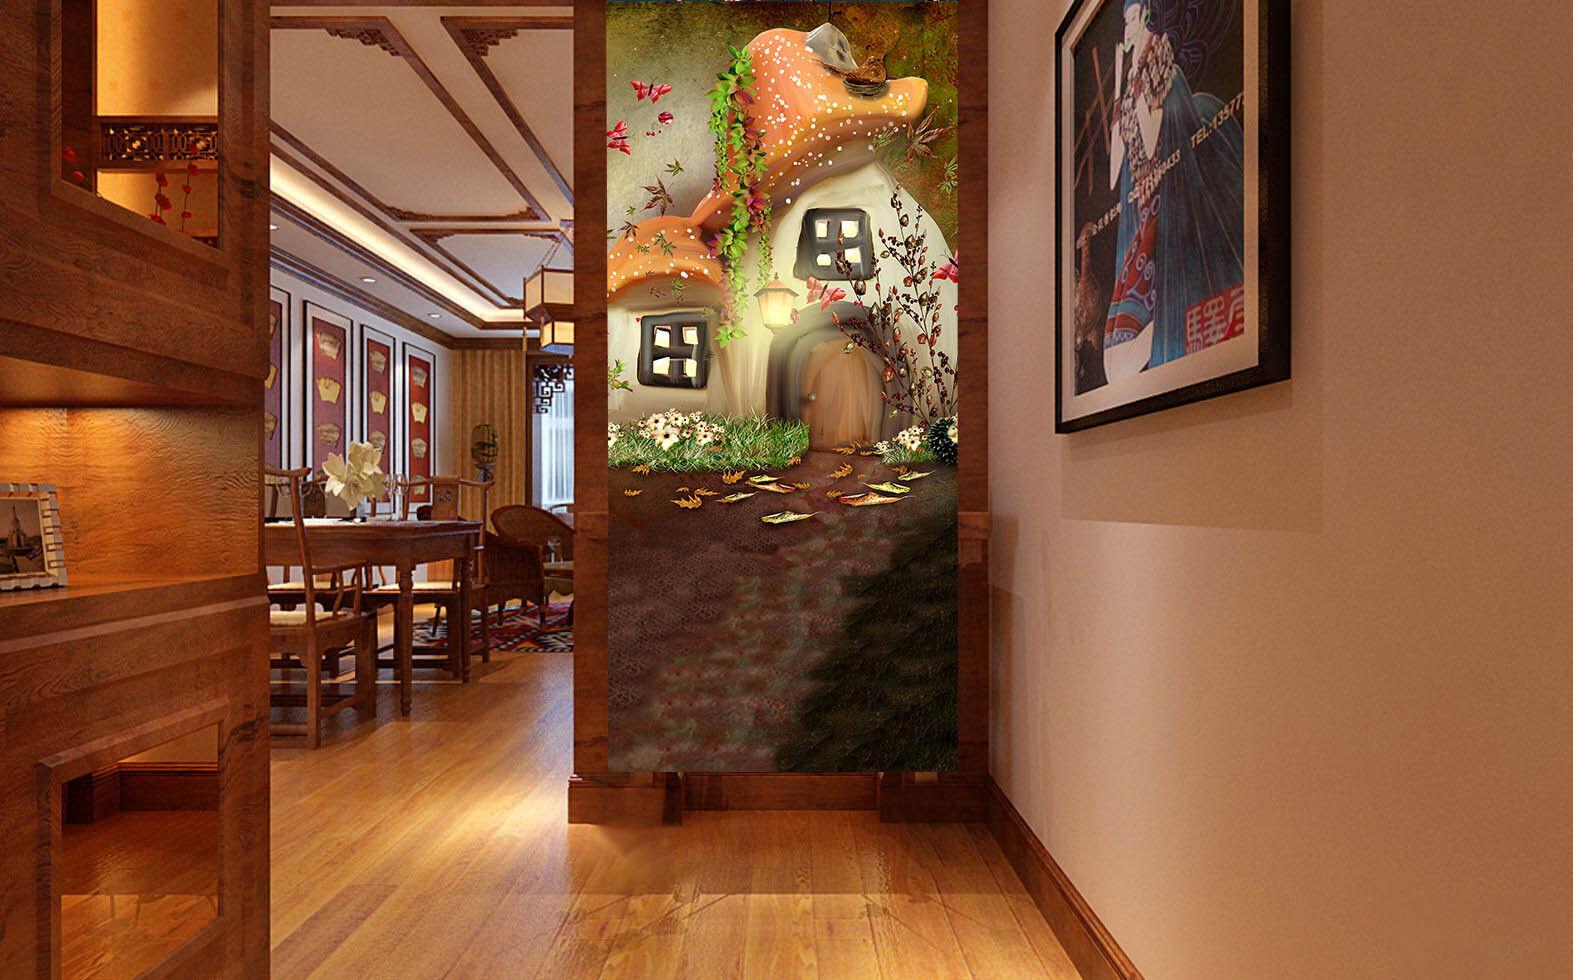 3D House Paint 505 Wallpaper Murals Wall Print Wall Mural AJ WALL AU Summer